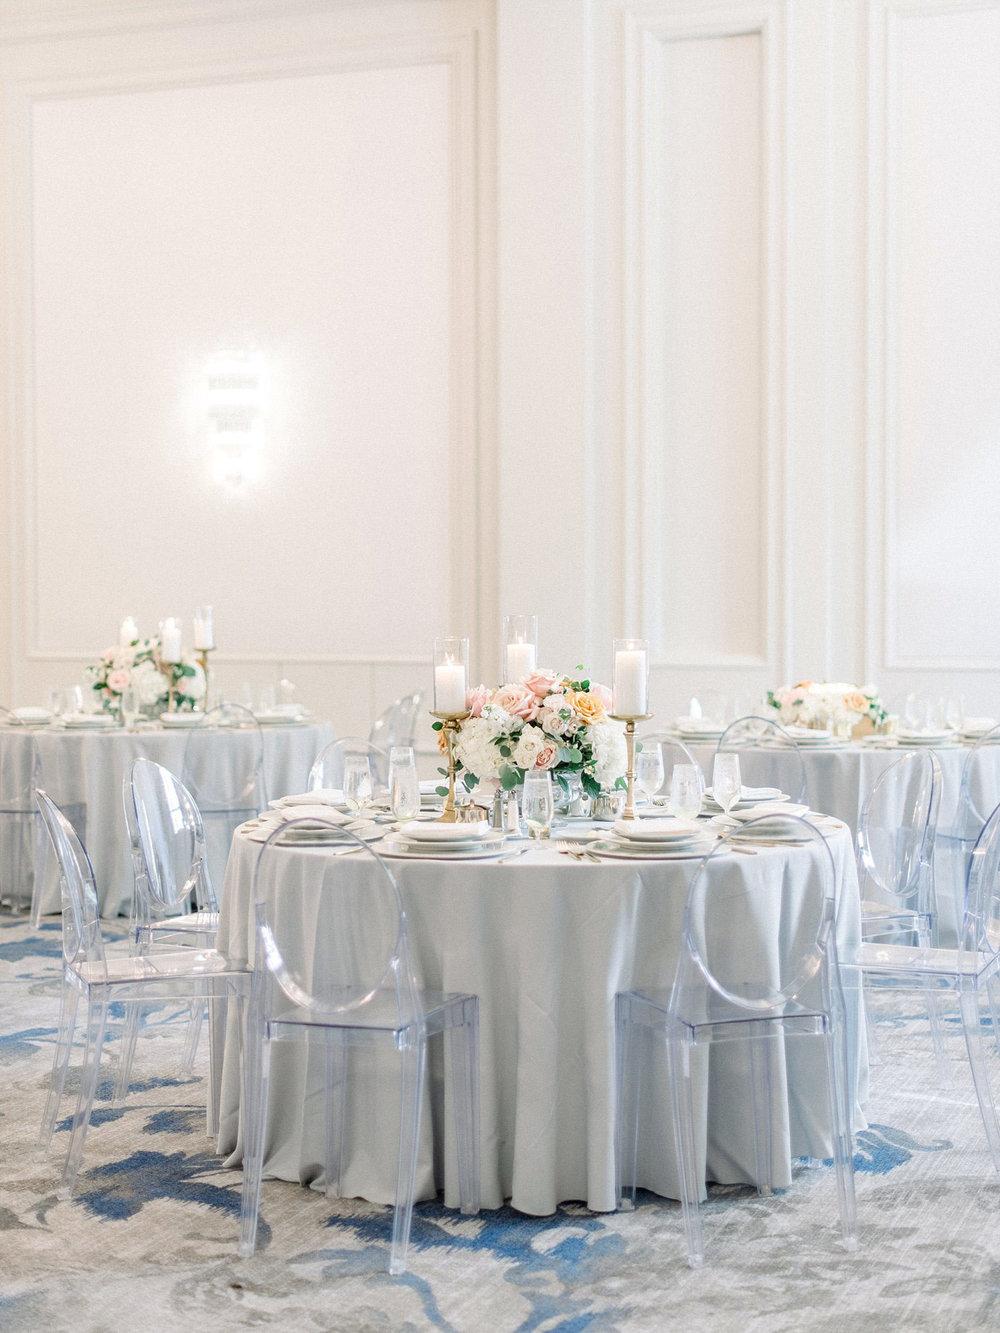 The Ritz Carlton Dallas ghost chair event